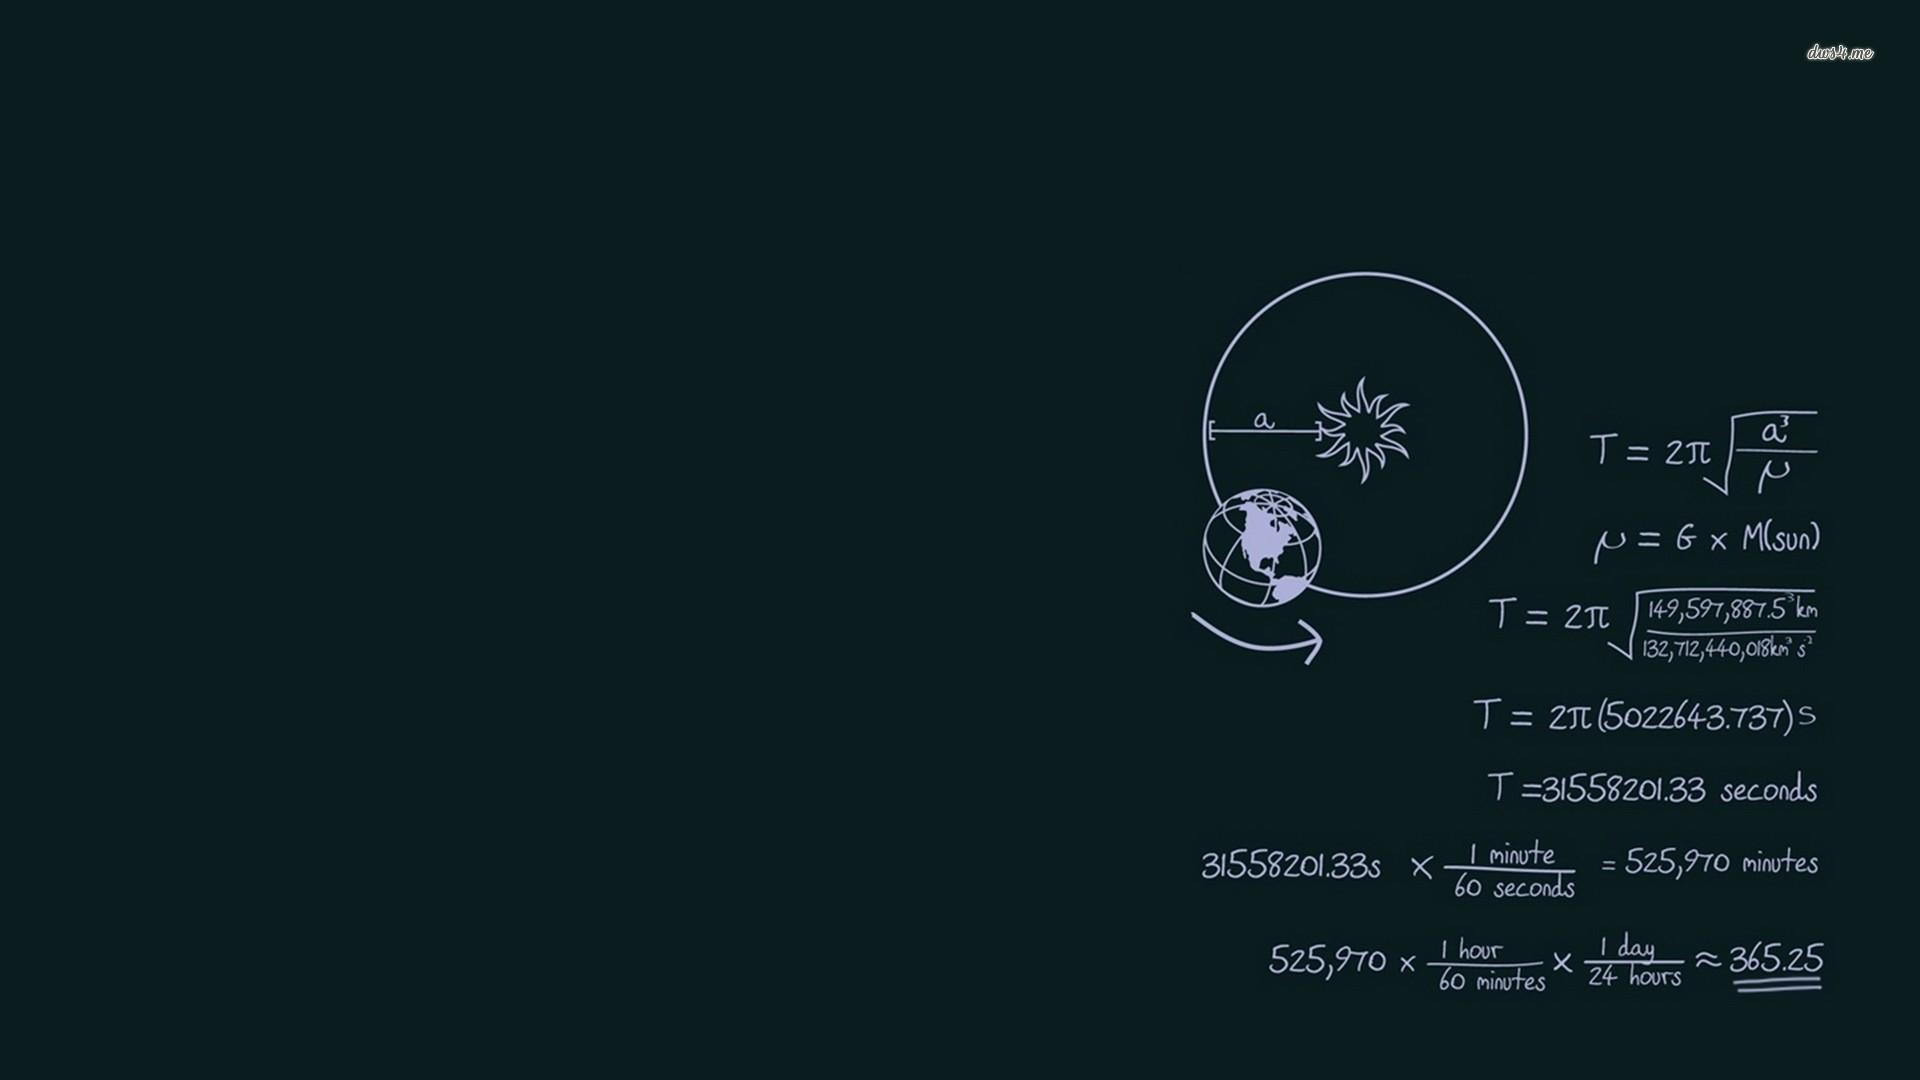 Download Desktop Wallpaper Science Hd Backgrounds Download